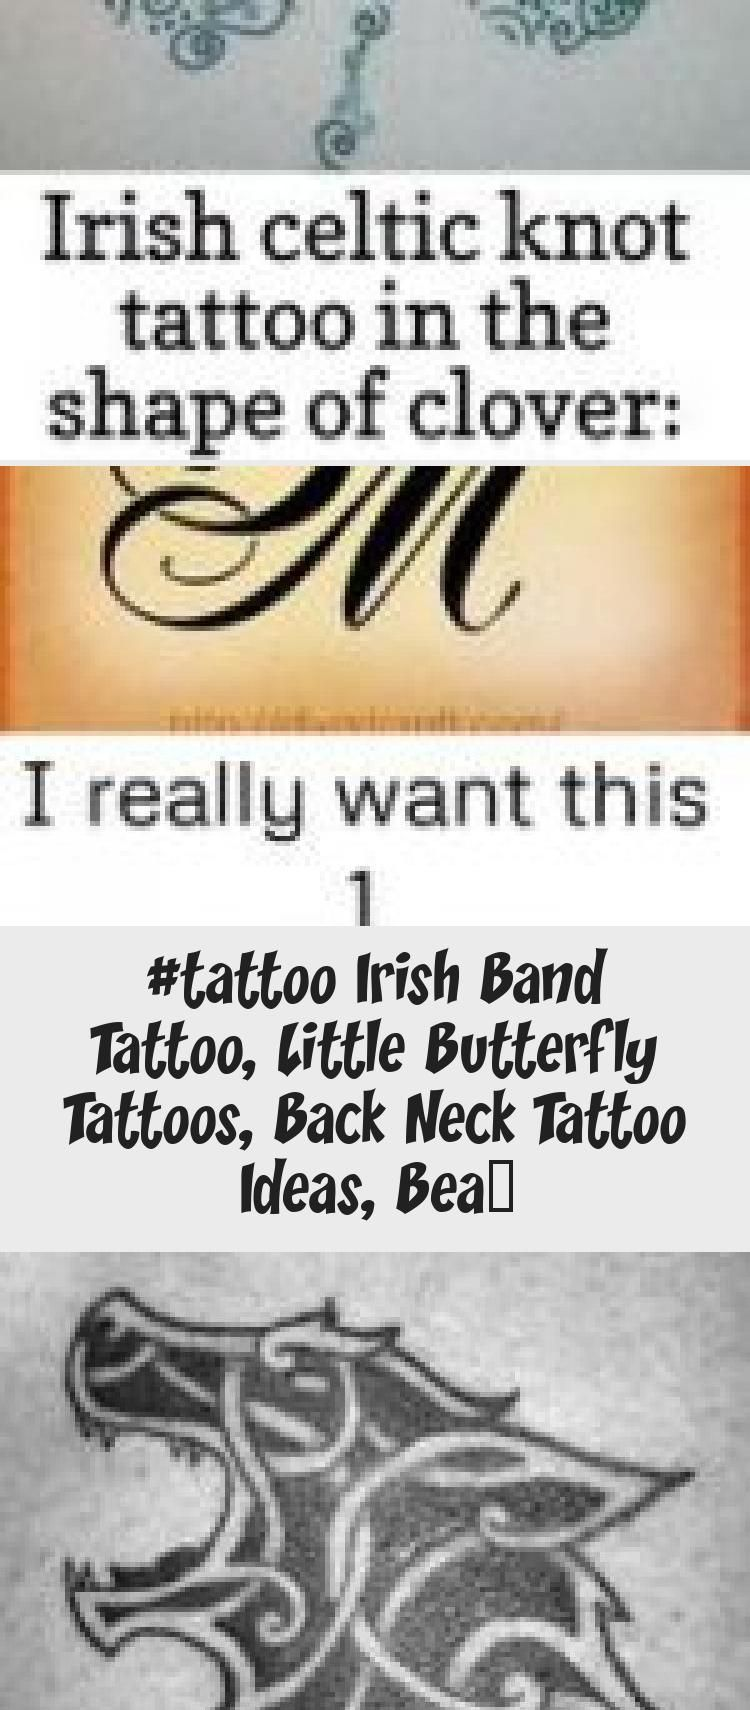 Photo of #Tattoo irish band tattoo, little butterfly tattoos, back neck tattoo ideas, bea…